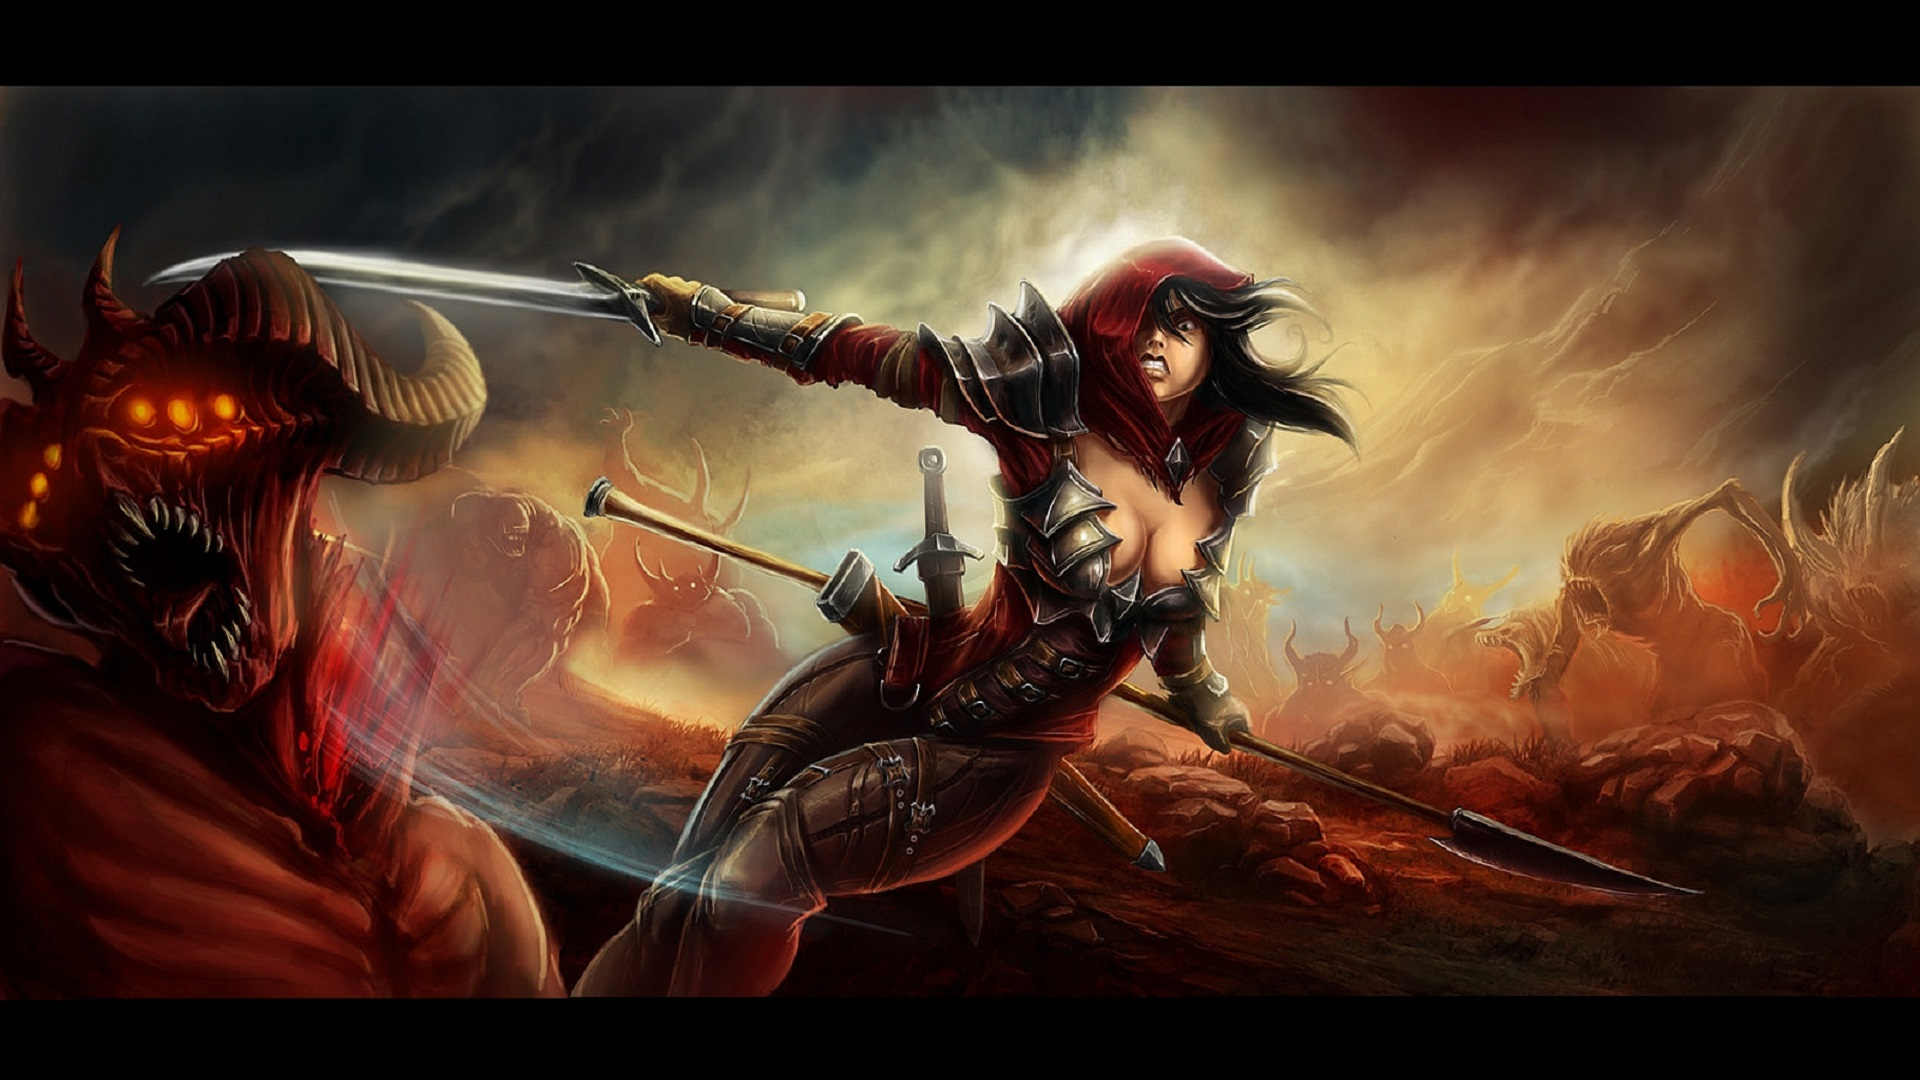 download wallpaper female warrior - photo #47